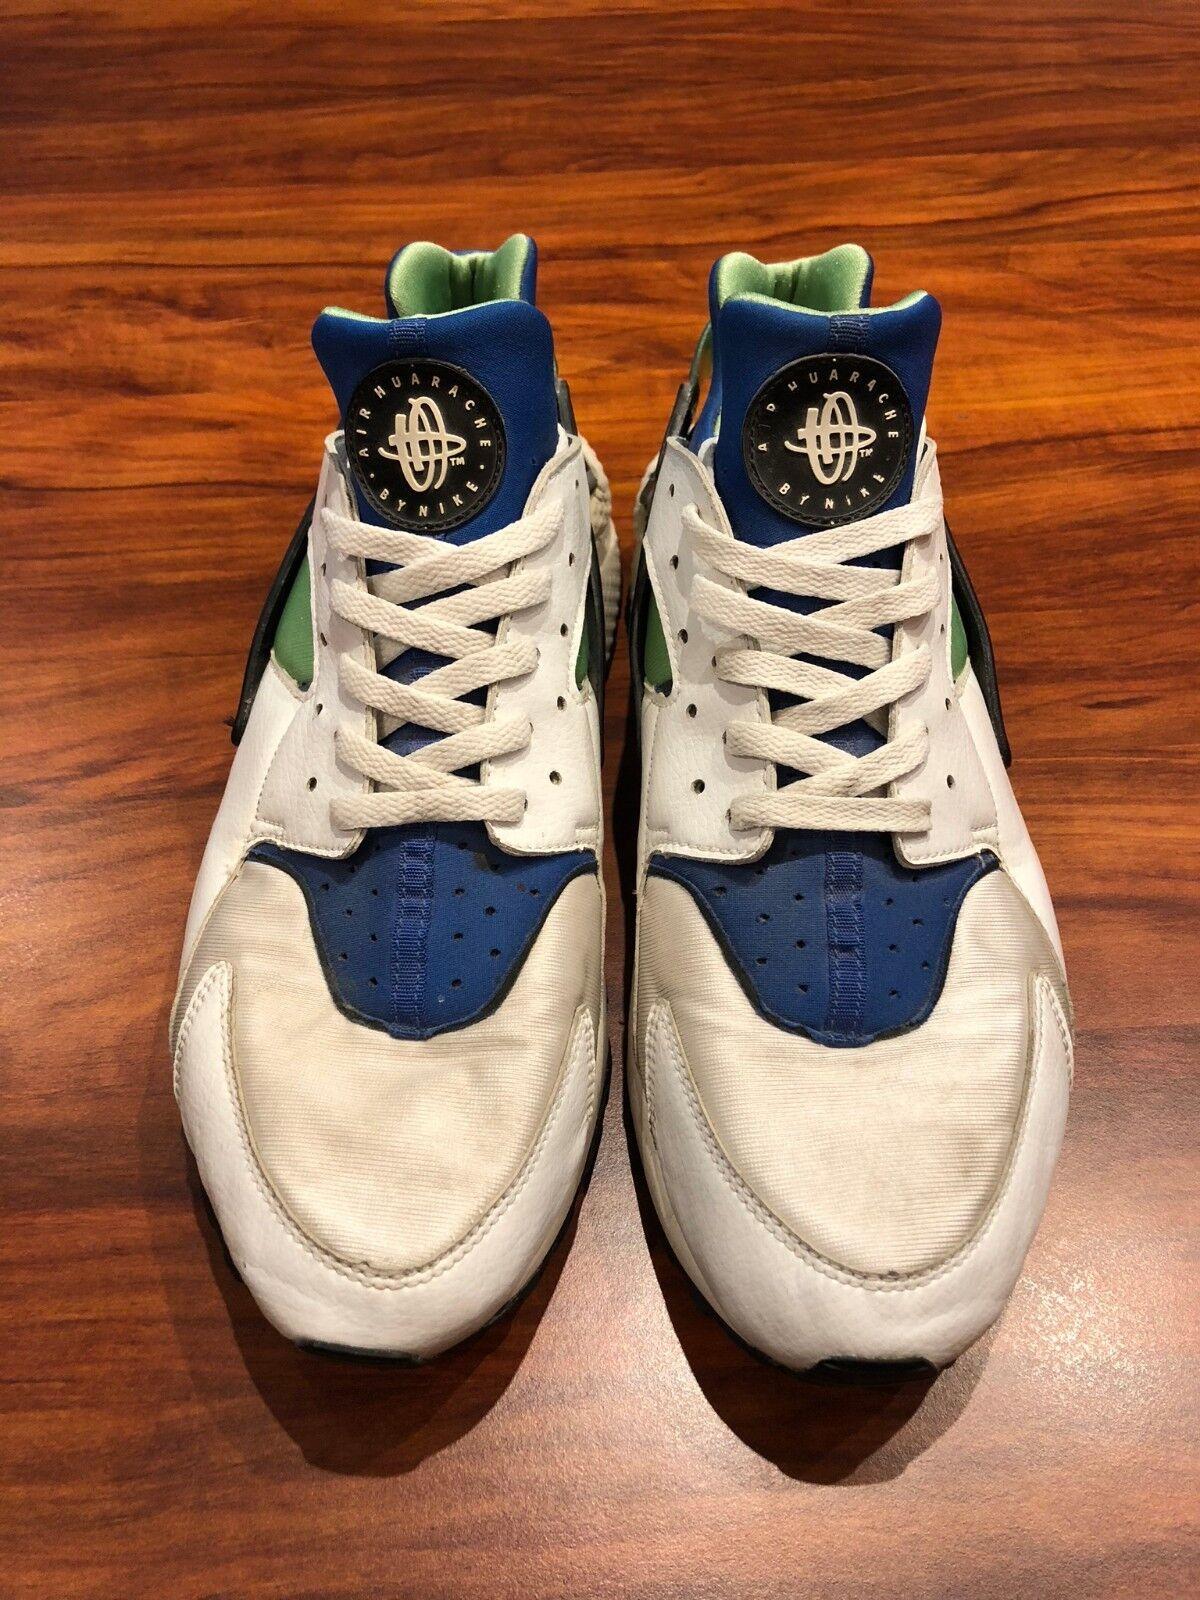 Nike Air Huarache blu verde bianca nero Vintage- US 13 I I EU 47.5